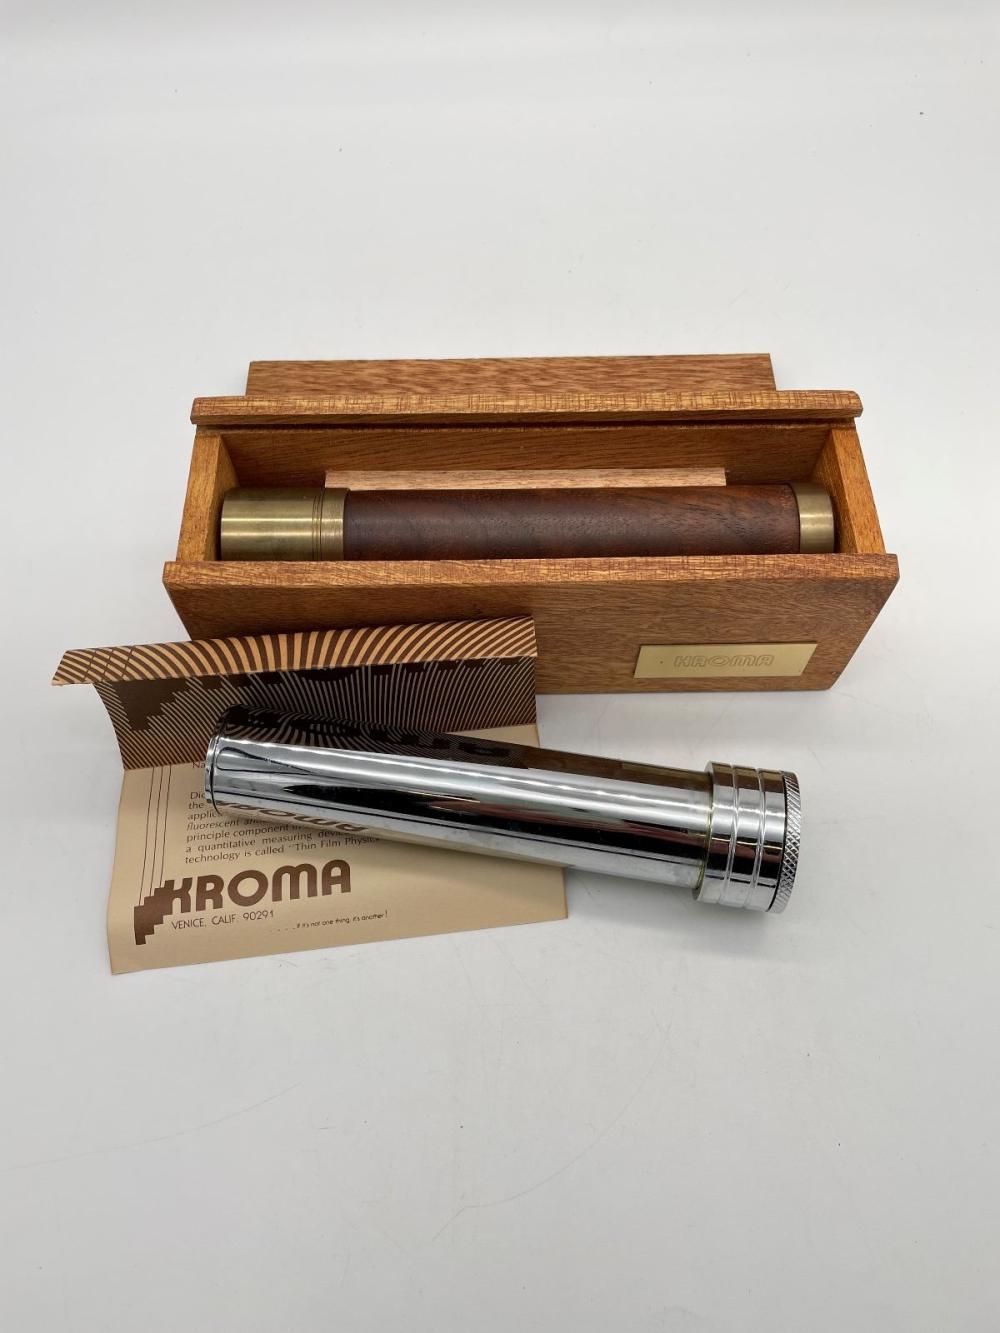 (2) Kroma Kaleidoscopes Chrome, Brass and Wood